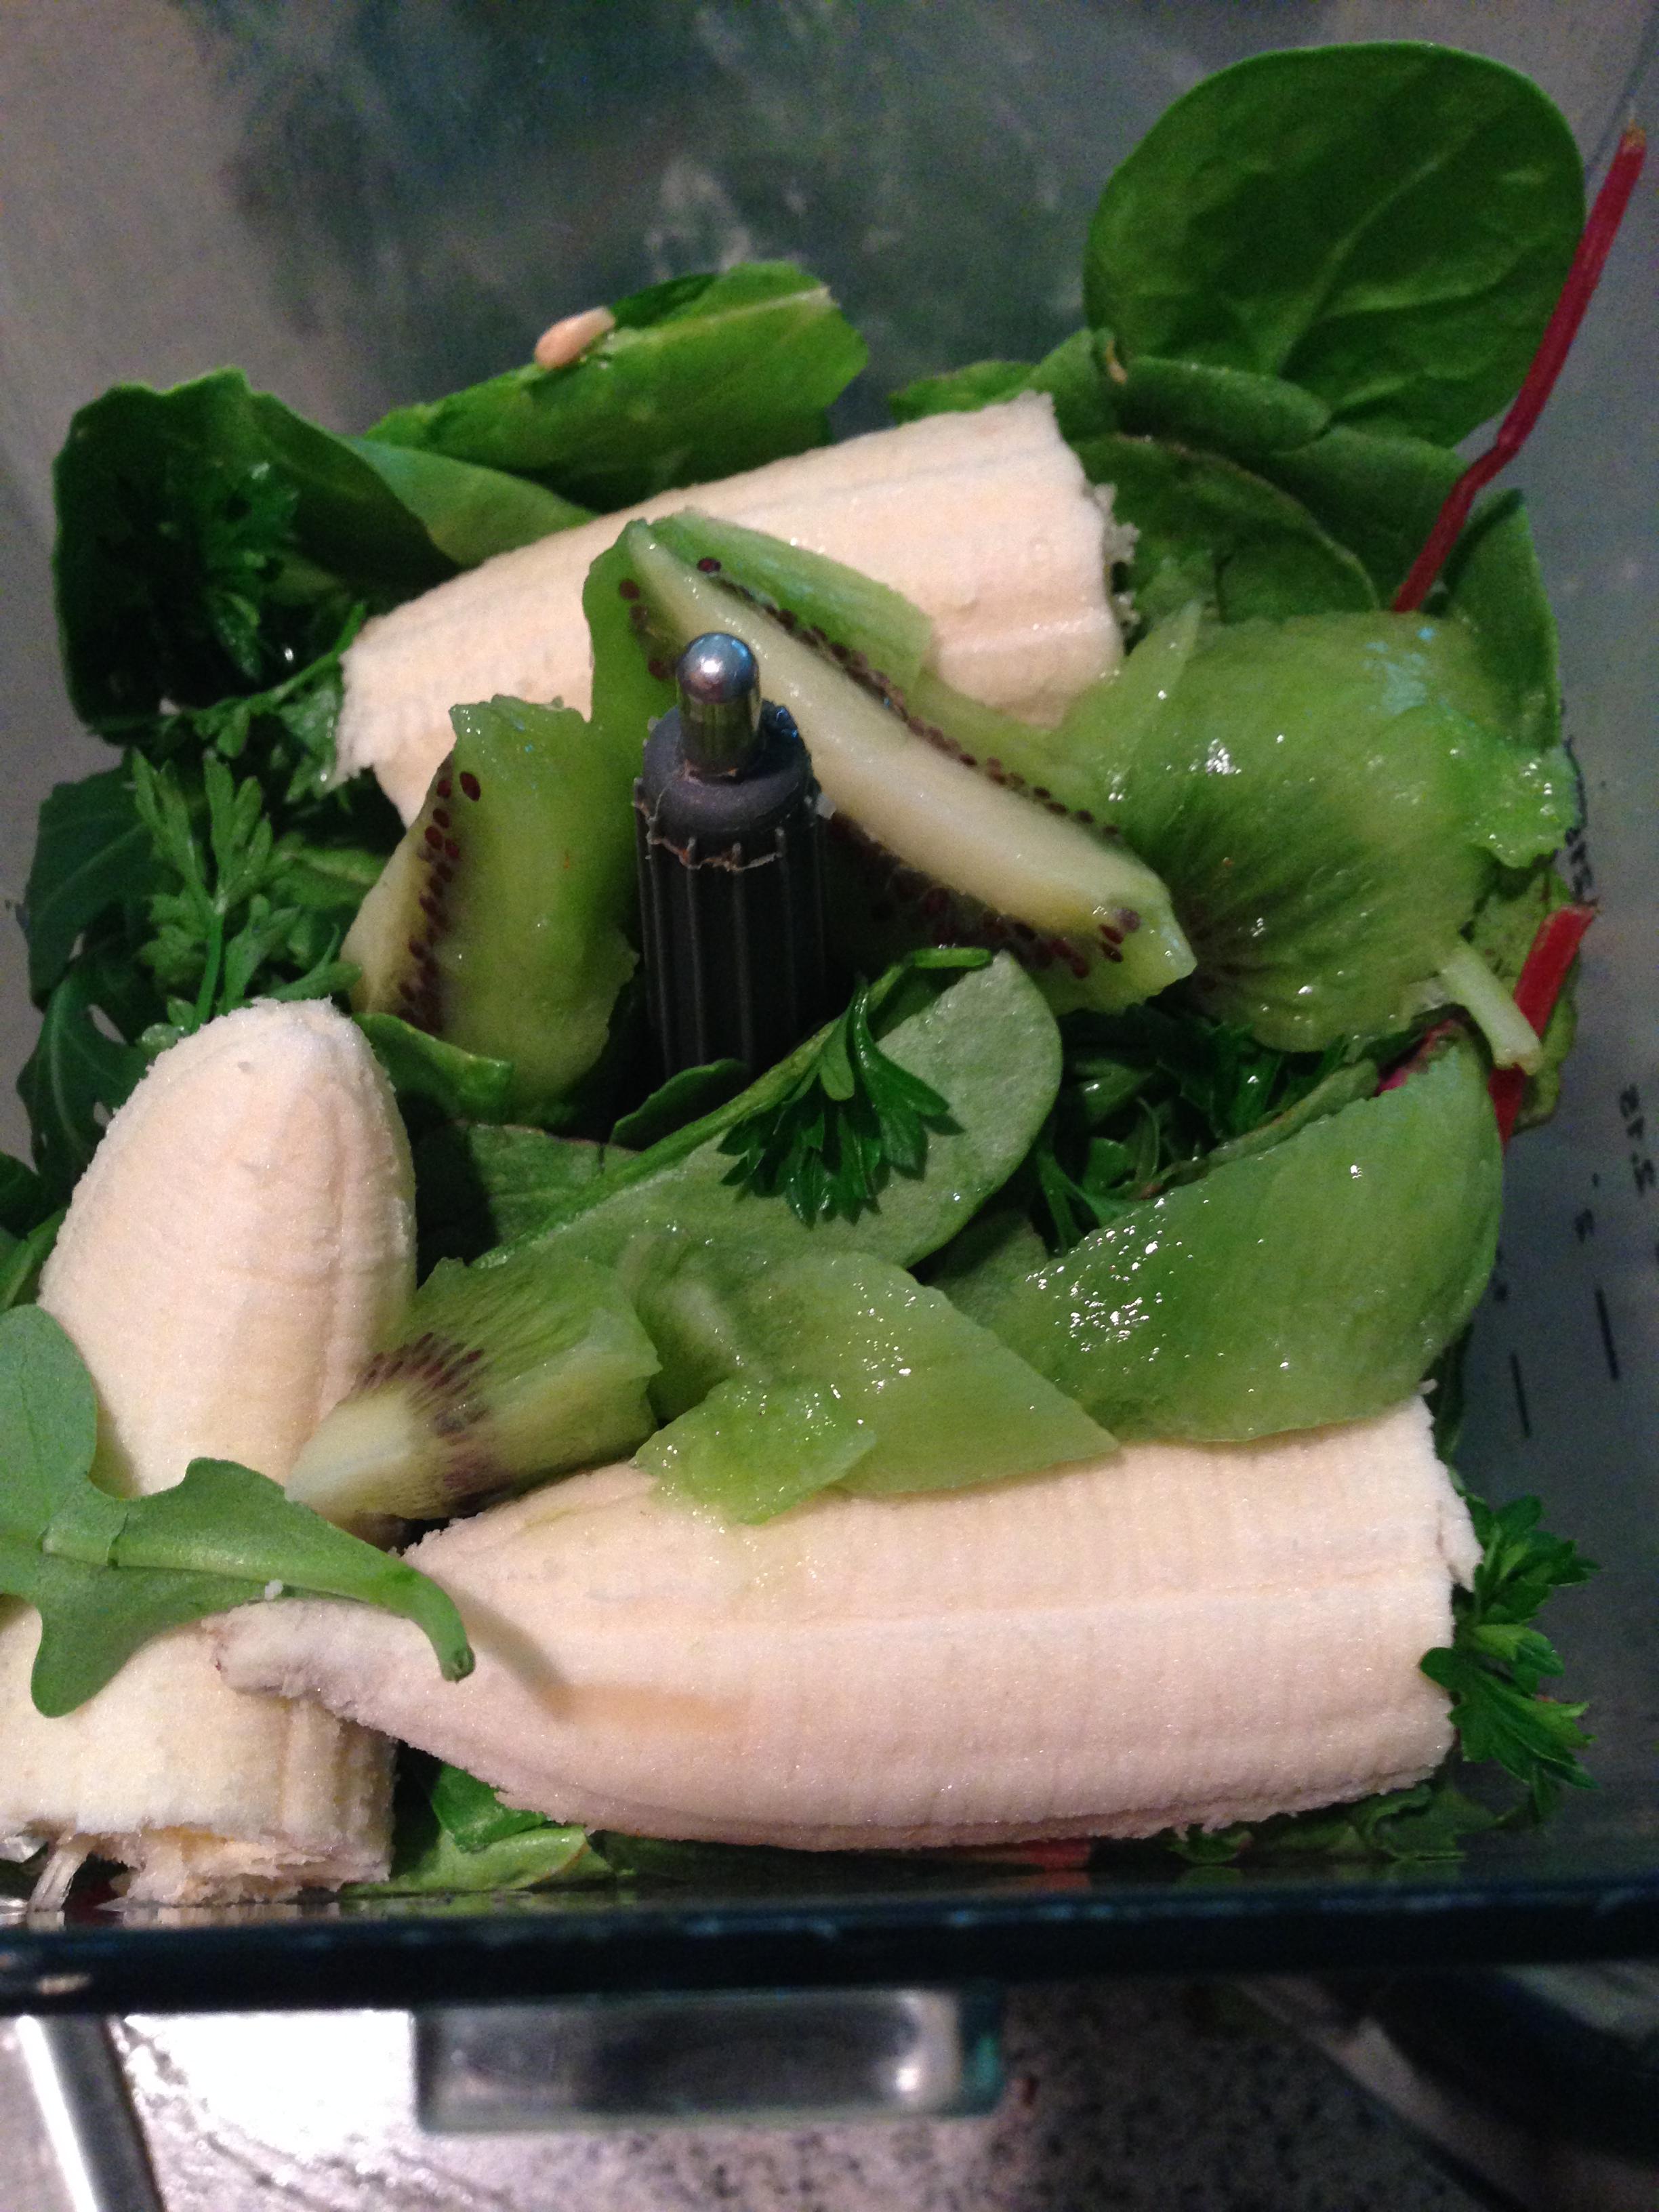 Green Smoothie Ingredients